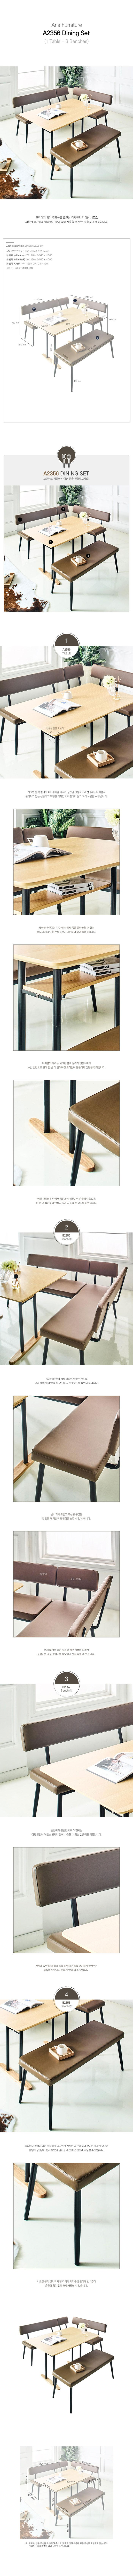 A2356-Dining-Set_181128.jpg